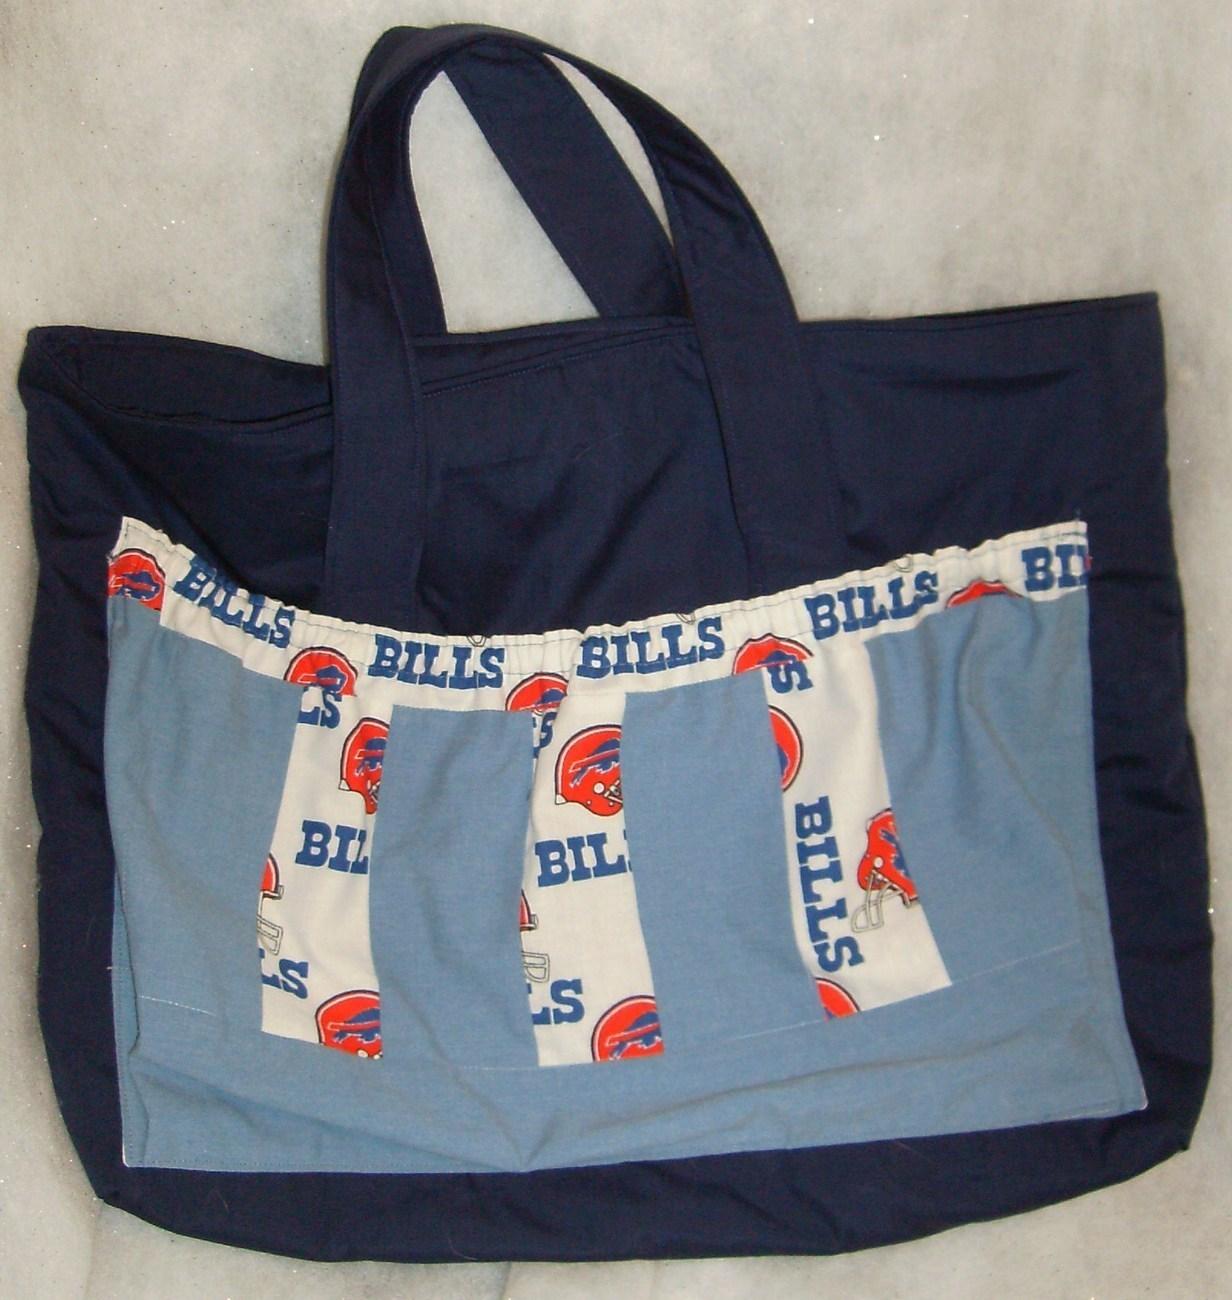 Bags_005